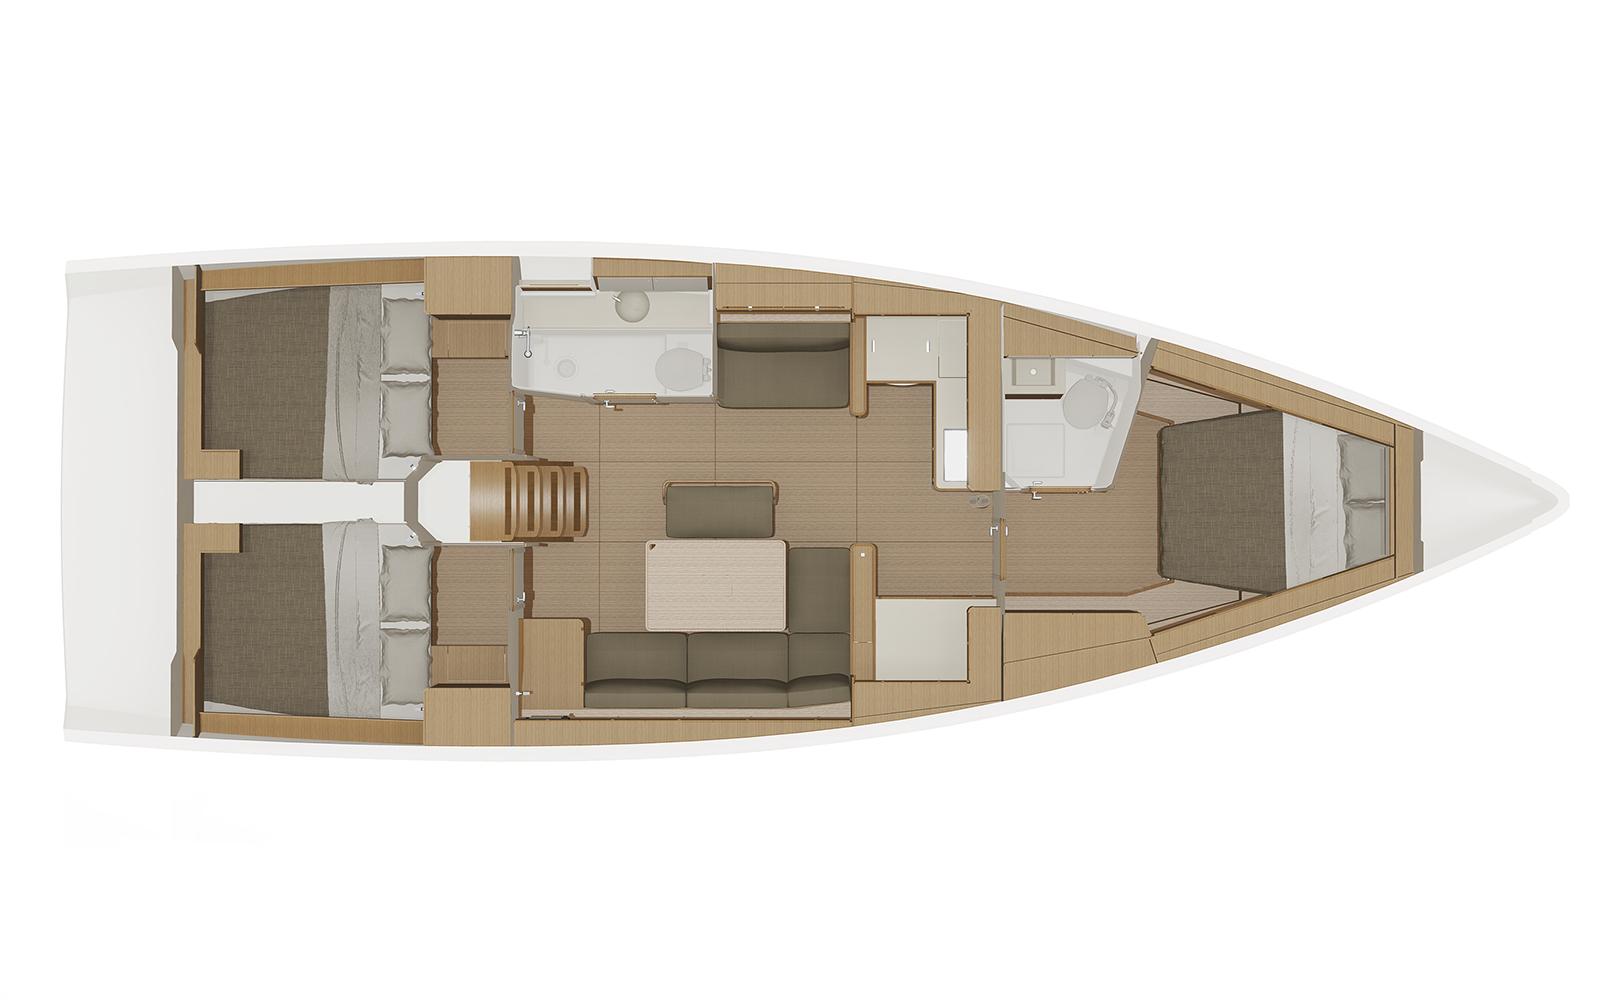 Modelo 8 - Boat Shopping